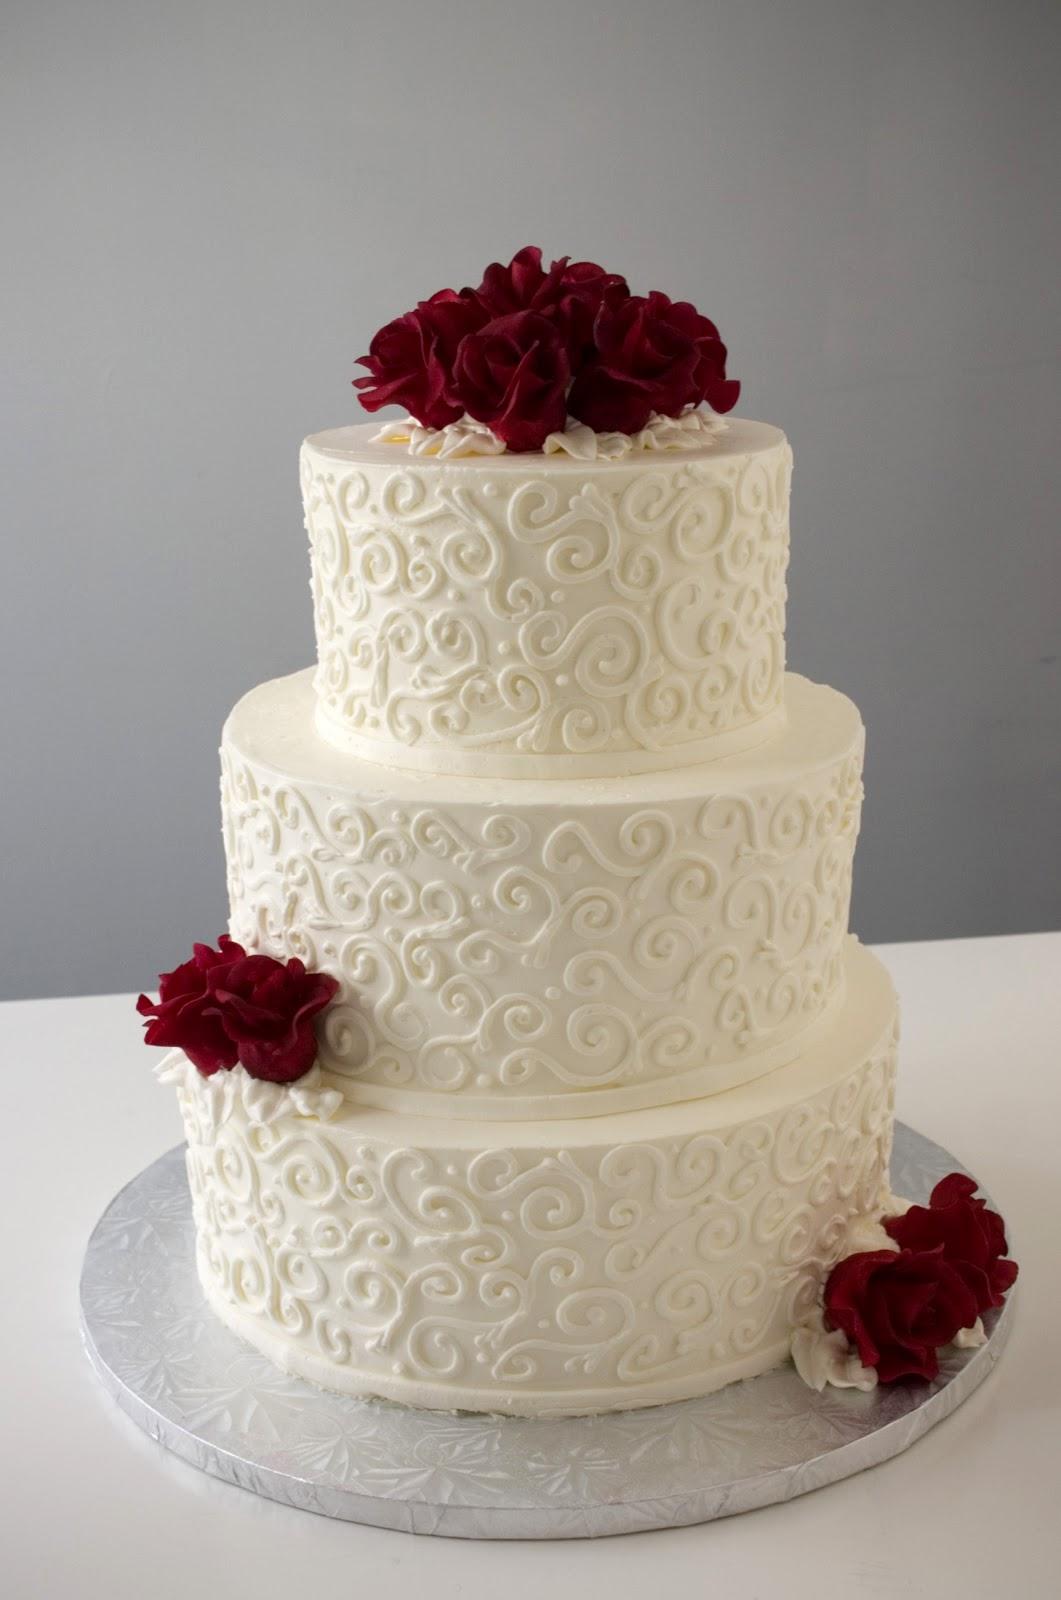 A Simple Cake: Customizing A Simple Cake